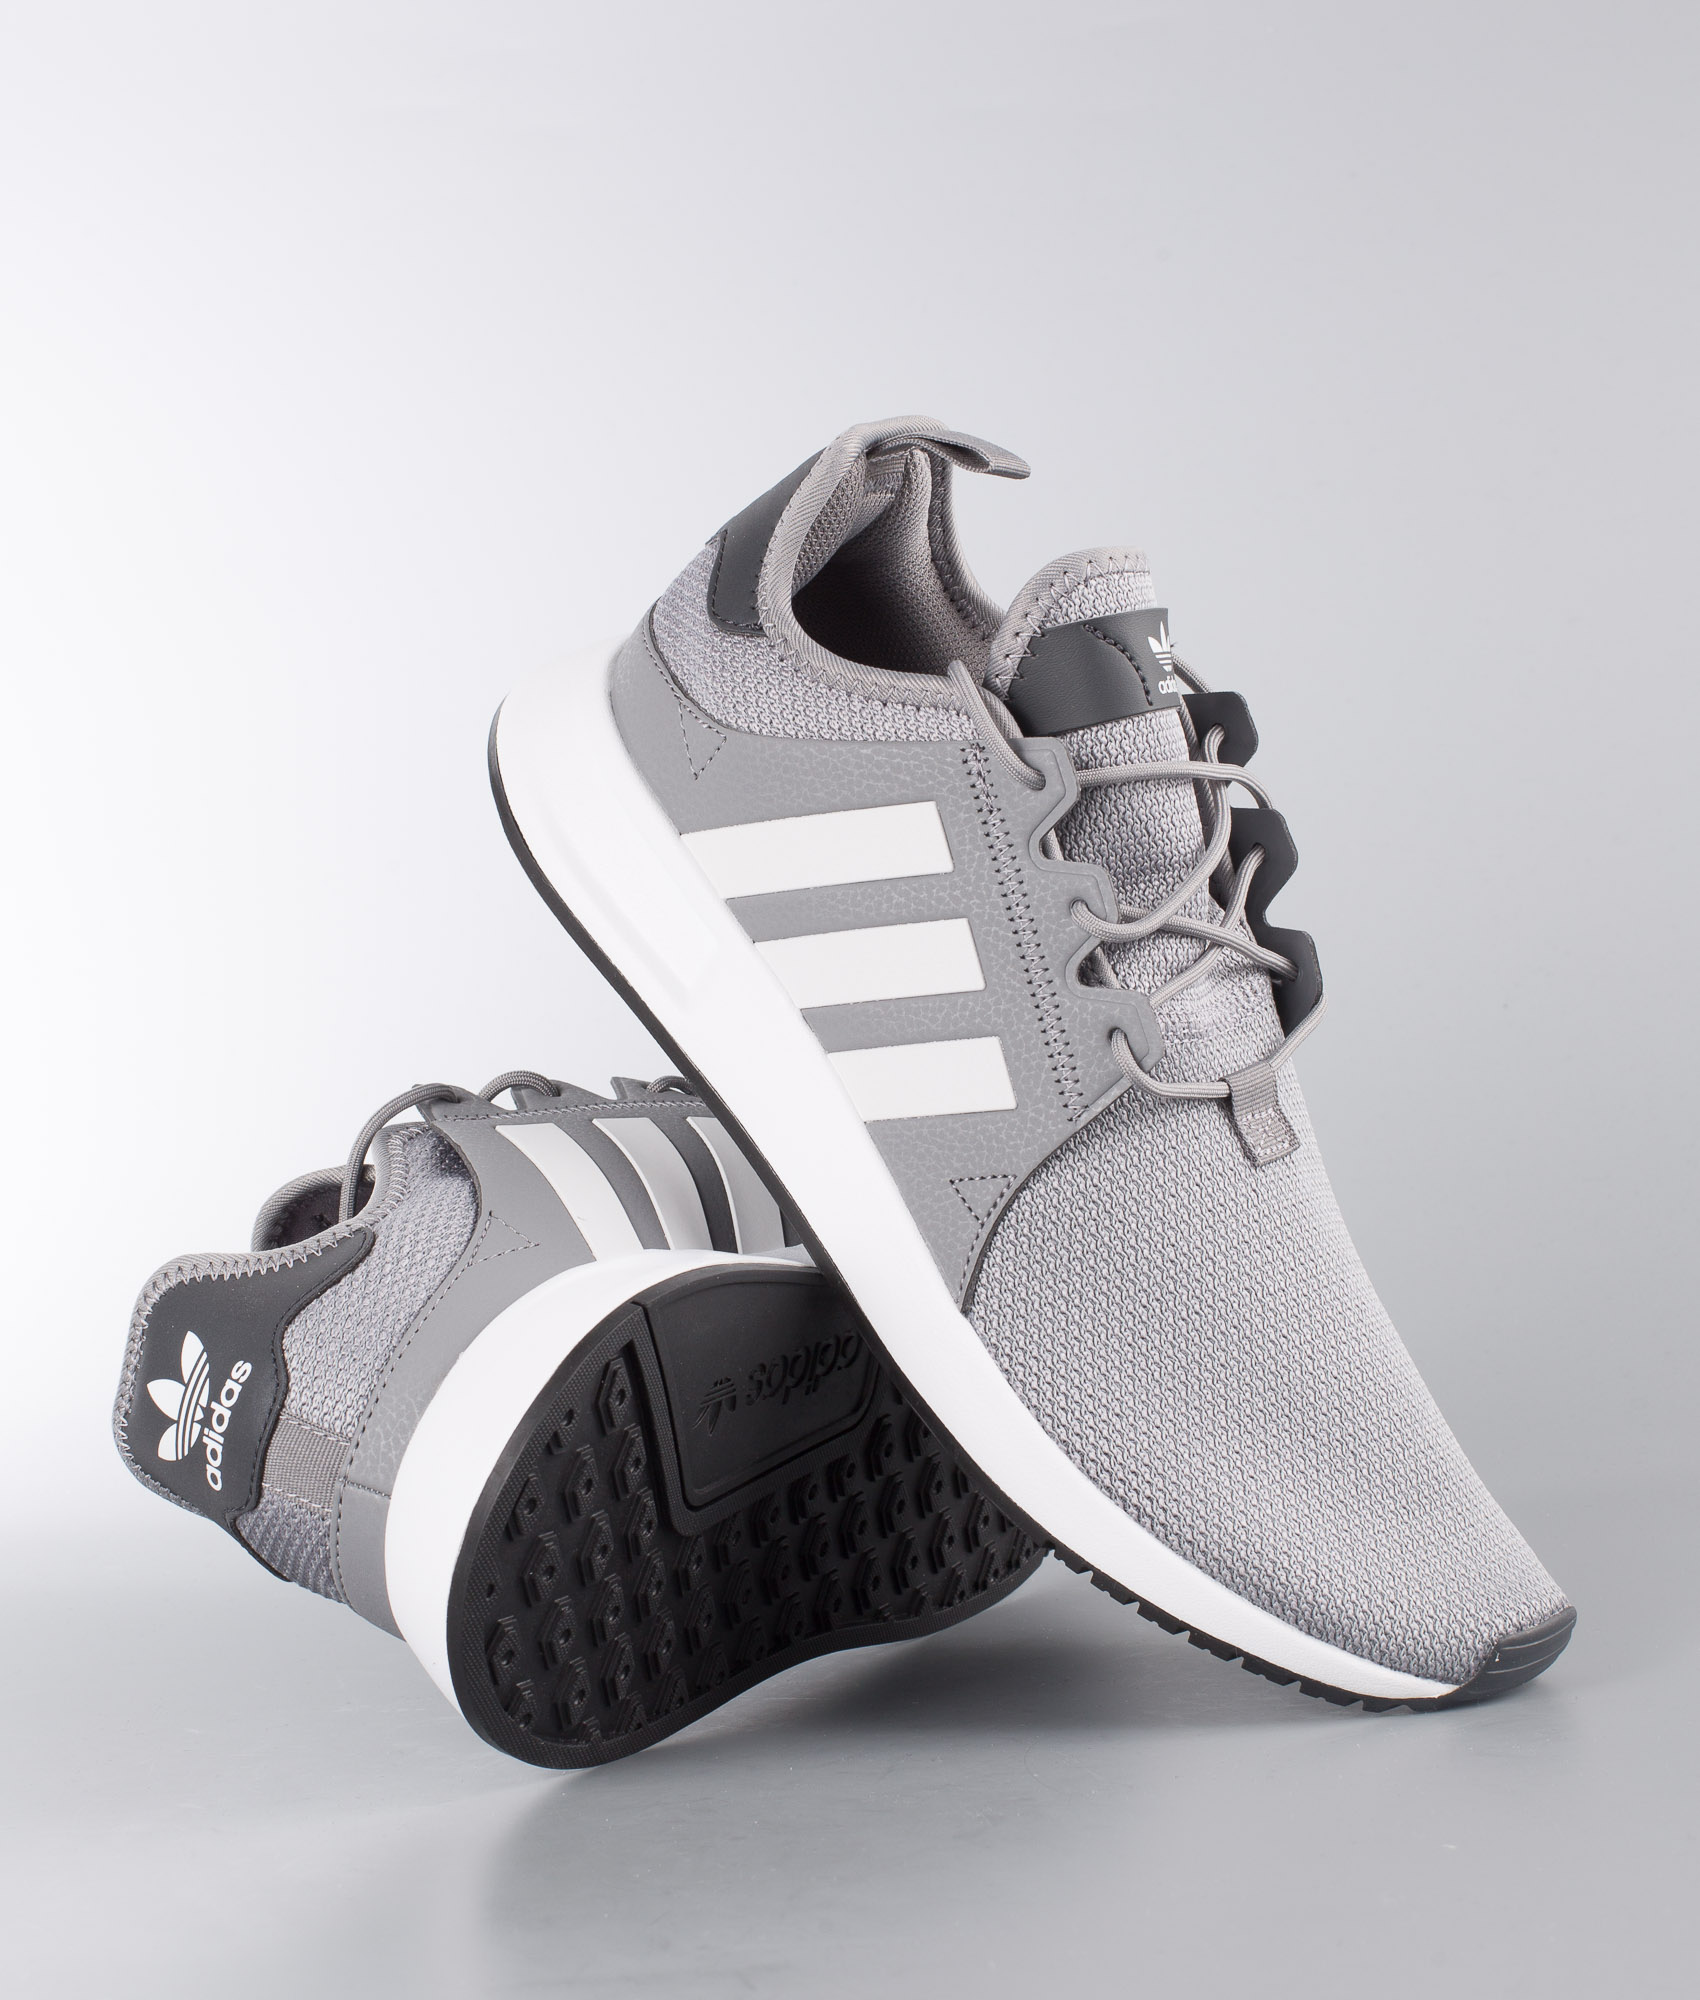 Threefootwear Scarpe Grey Whitecarbon plr Adidas Originals X X7TWF